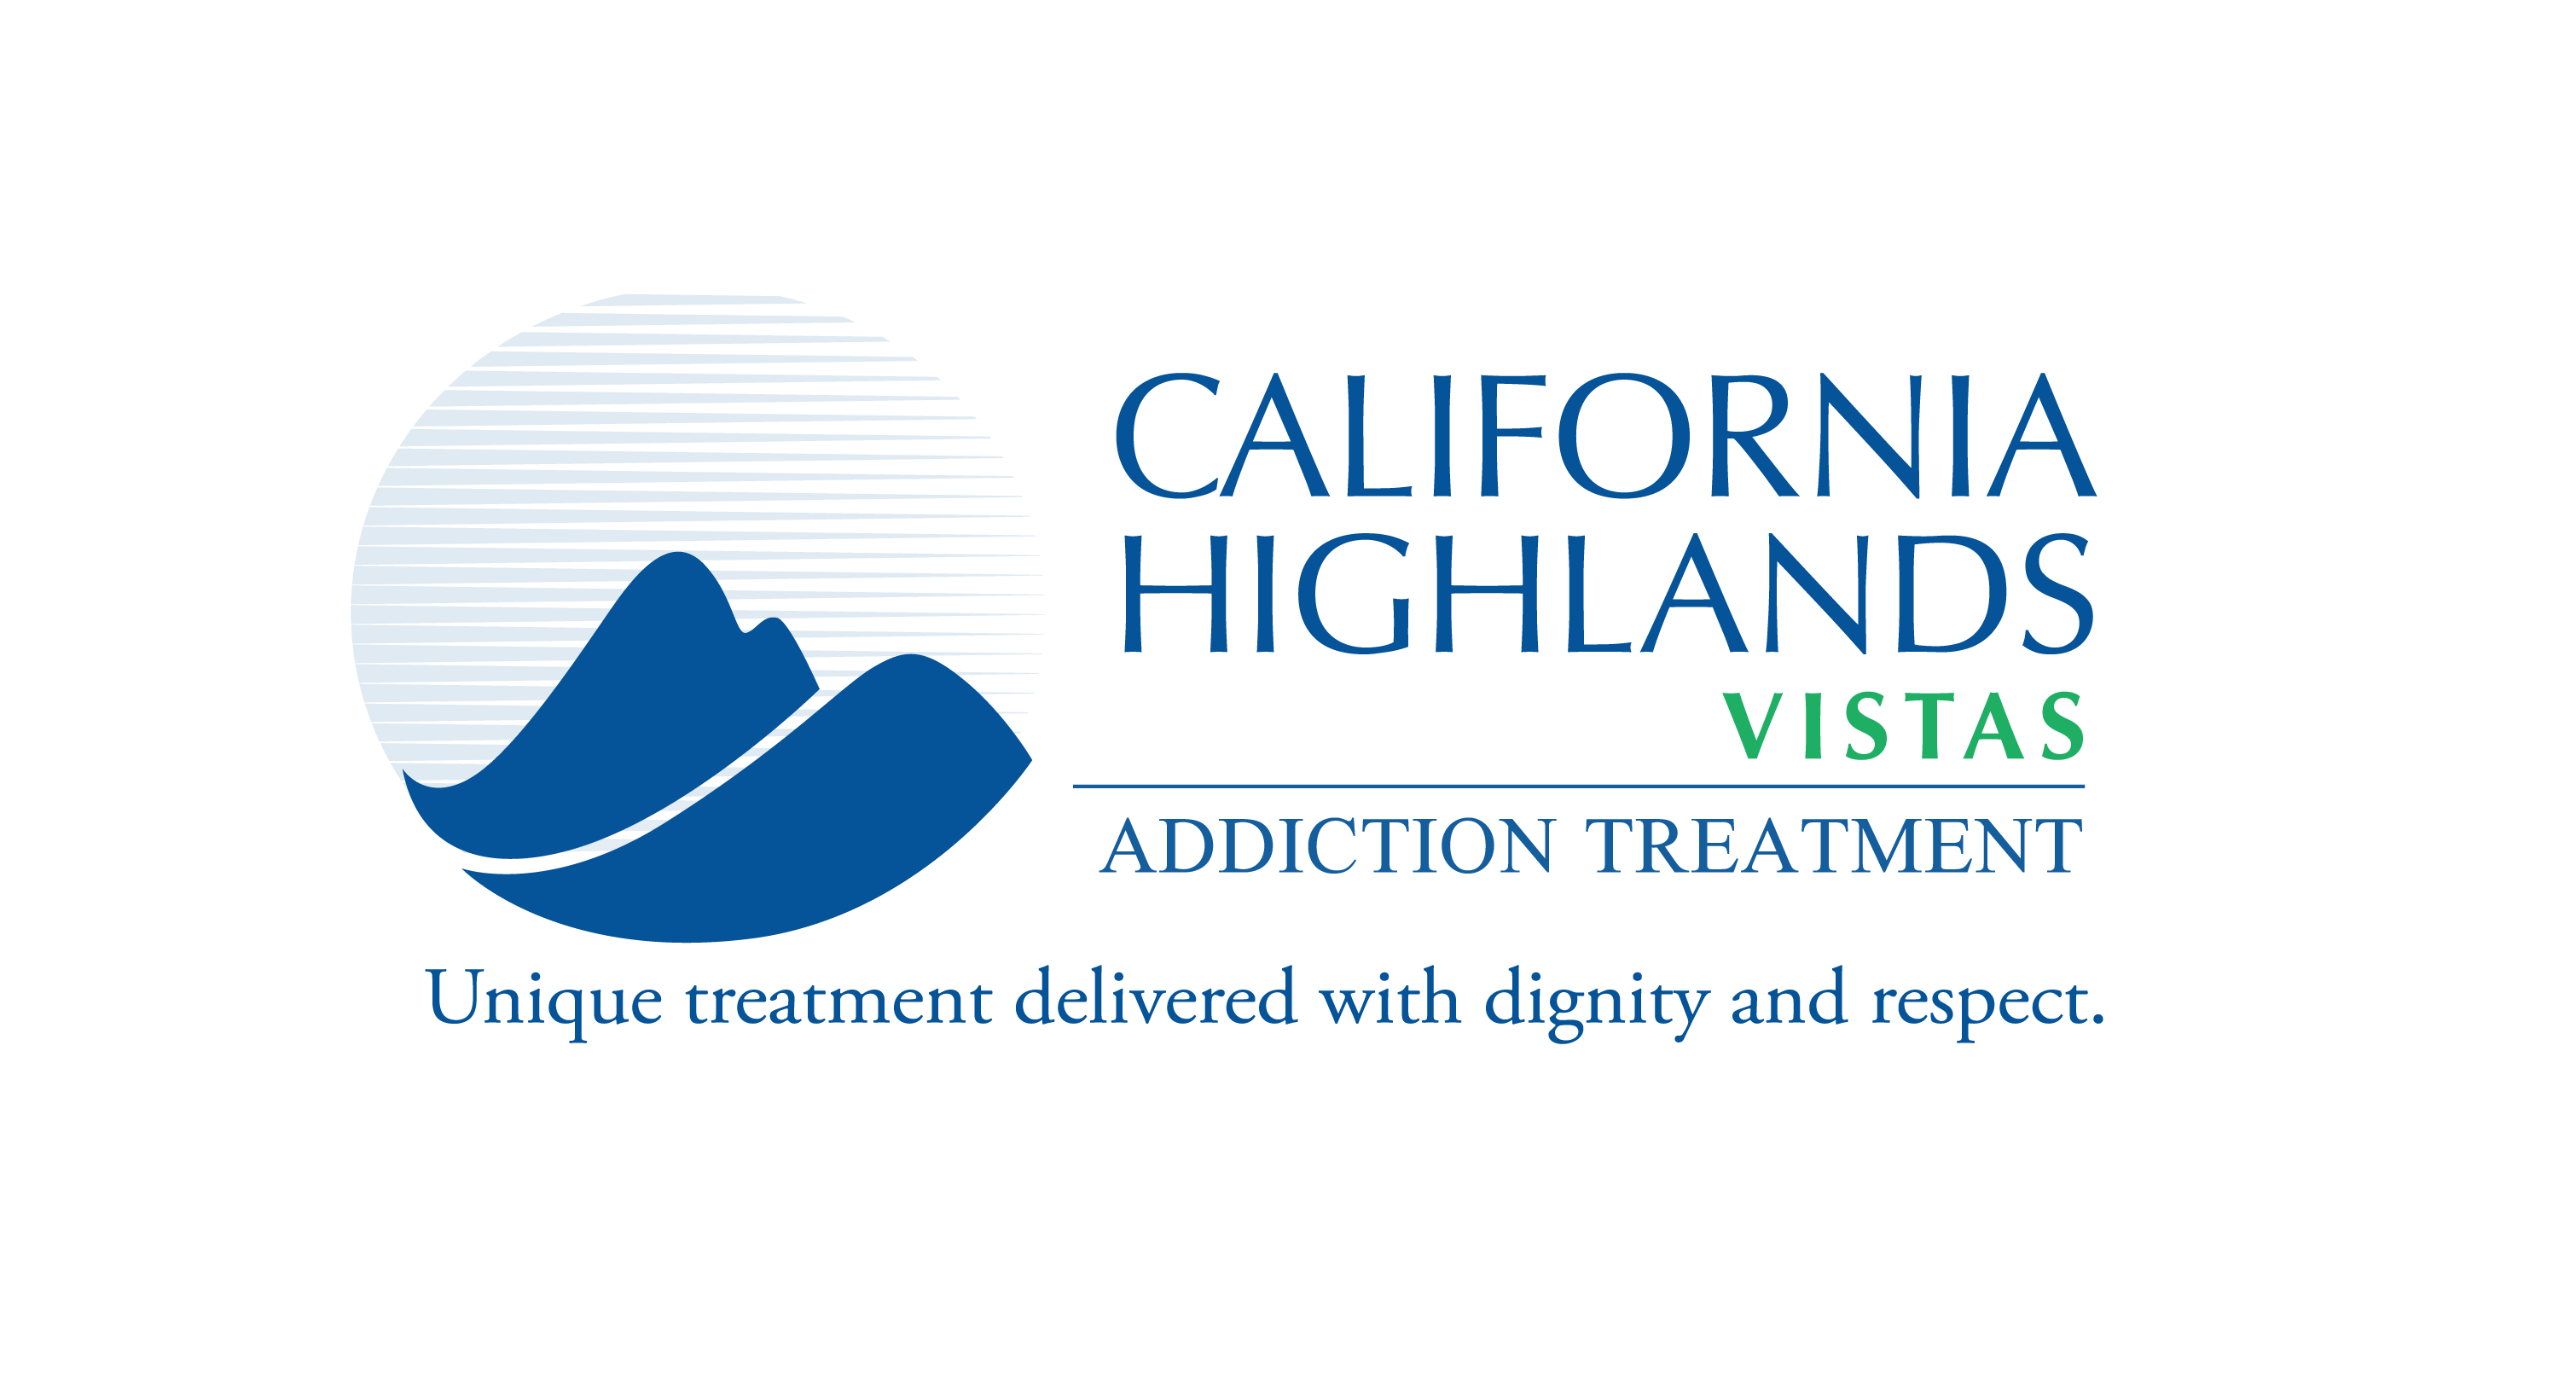 California Highlands Vistas logo